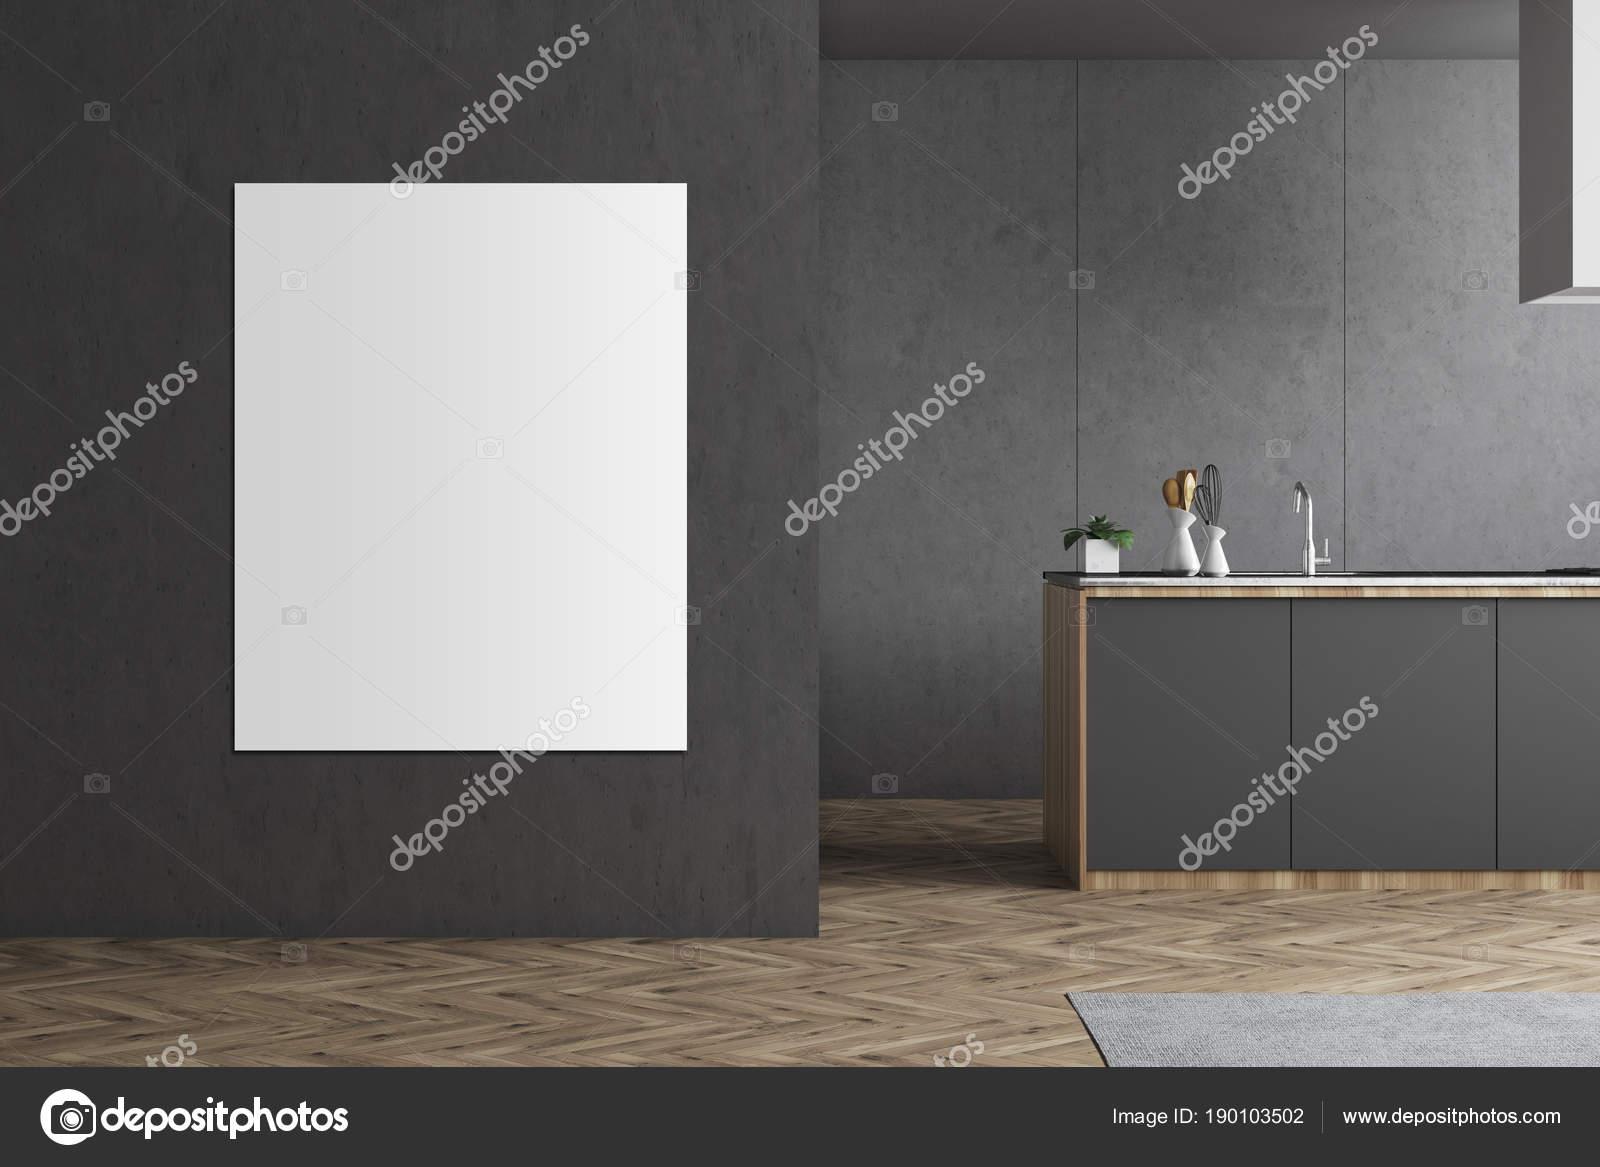 grey kitchen countertops swivel chairs 灰色厨房台面和海报 图库照片 c denisismagilov 190103502